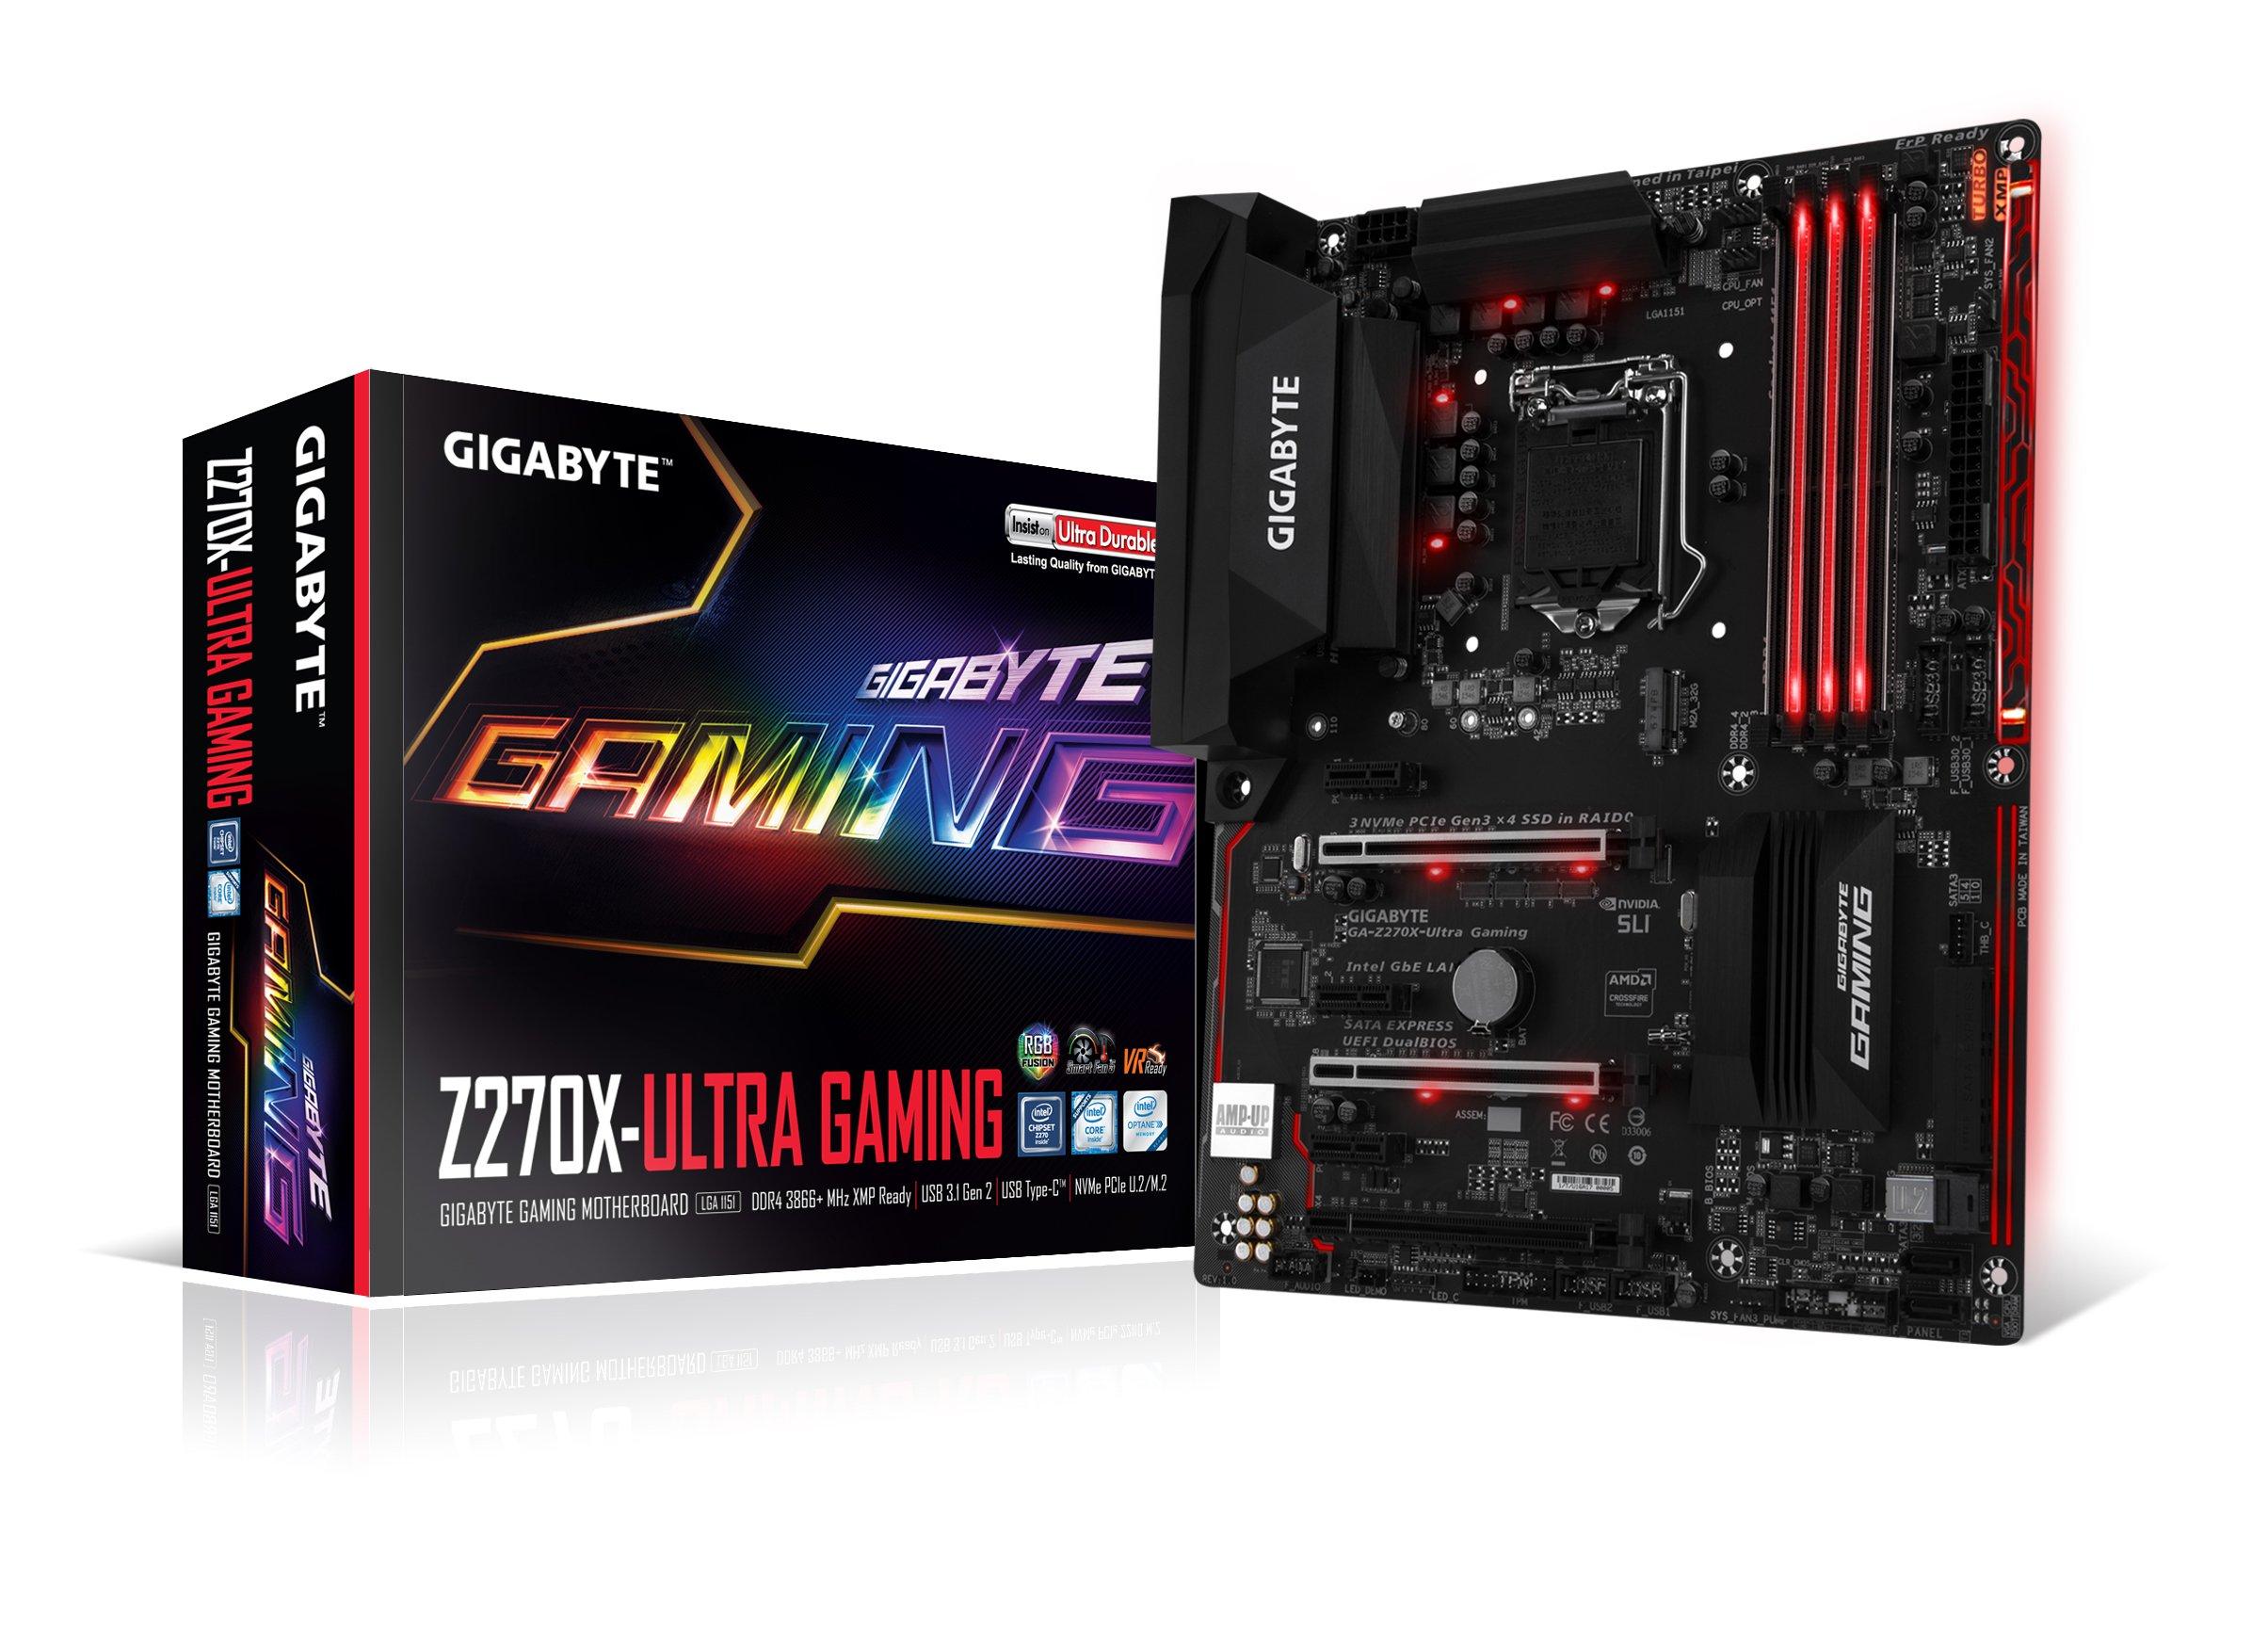 GIGABYTE GA-Z270X-Ultra Gaming LGA1151 Intel 2-Way SLI ATX DDR4 Motherboard by Gigabyte